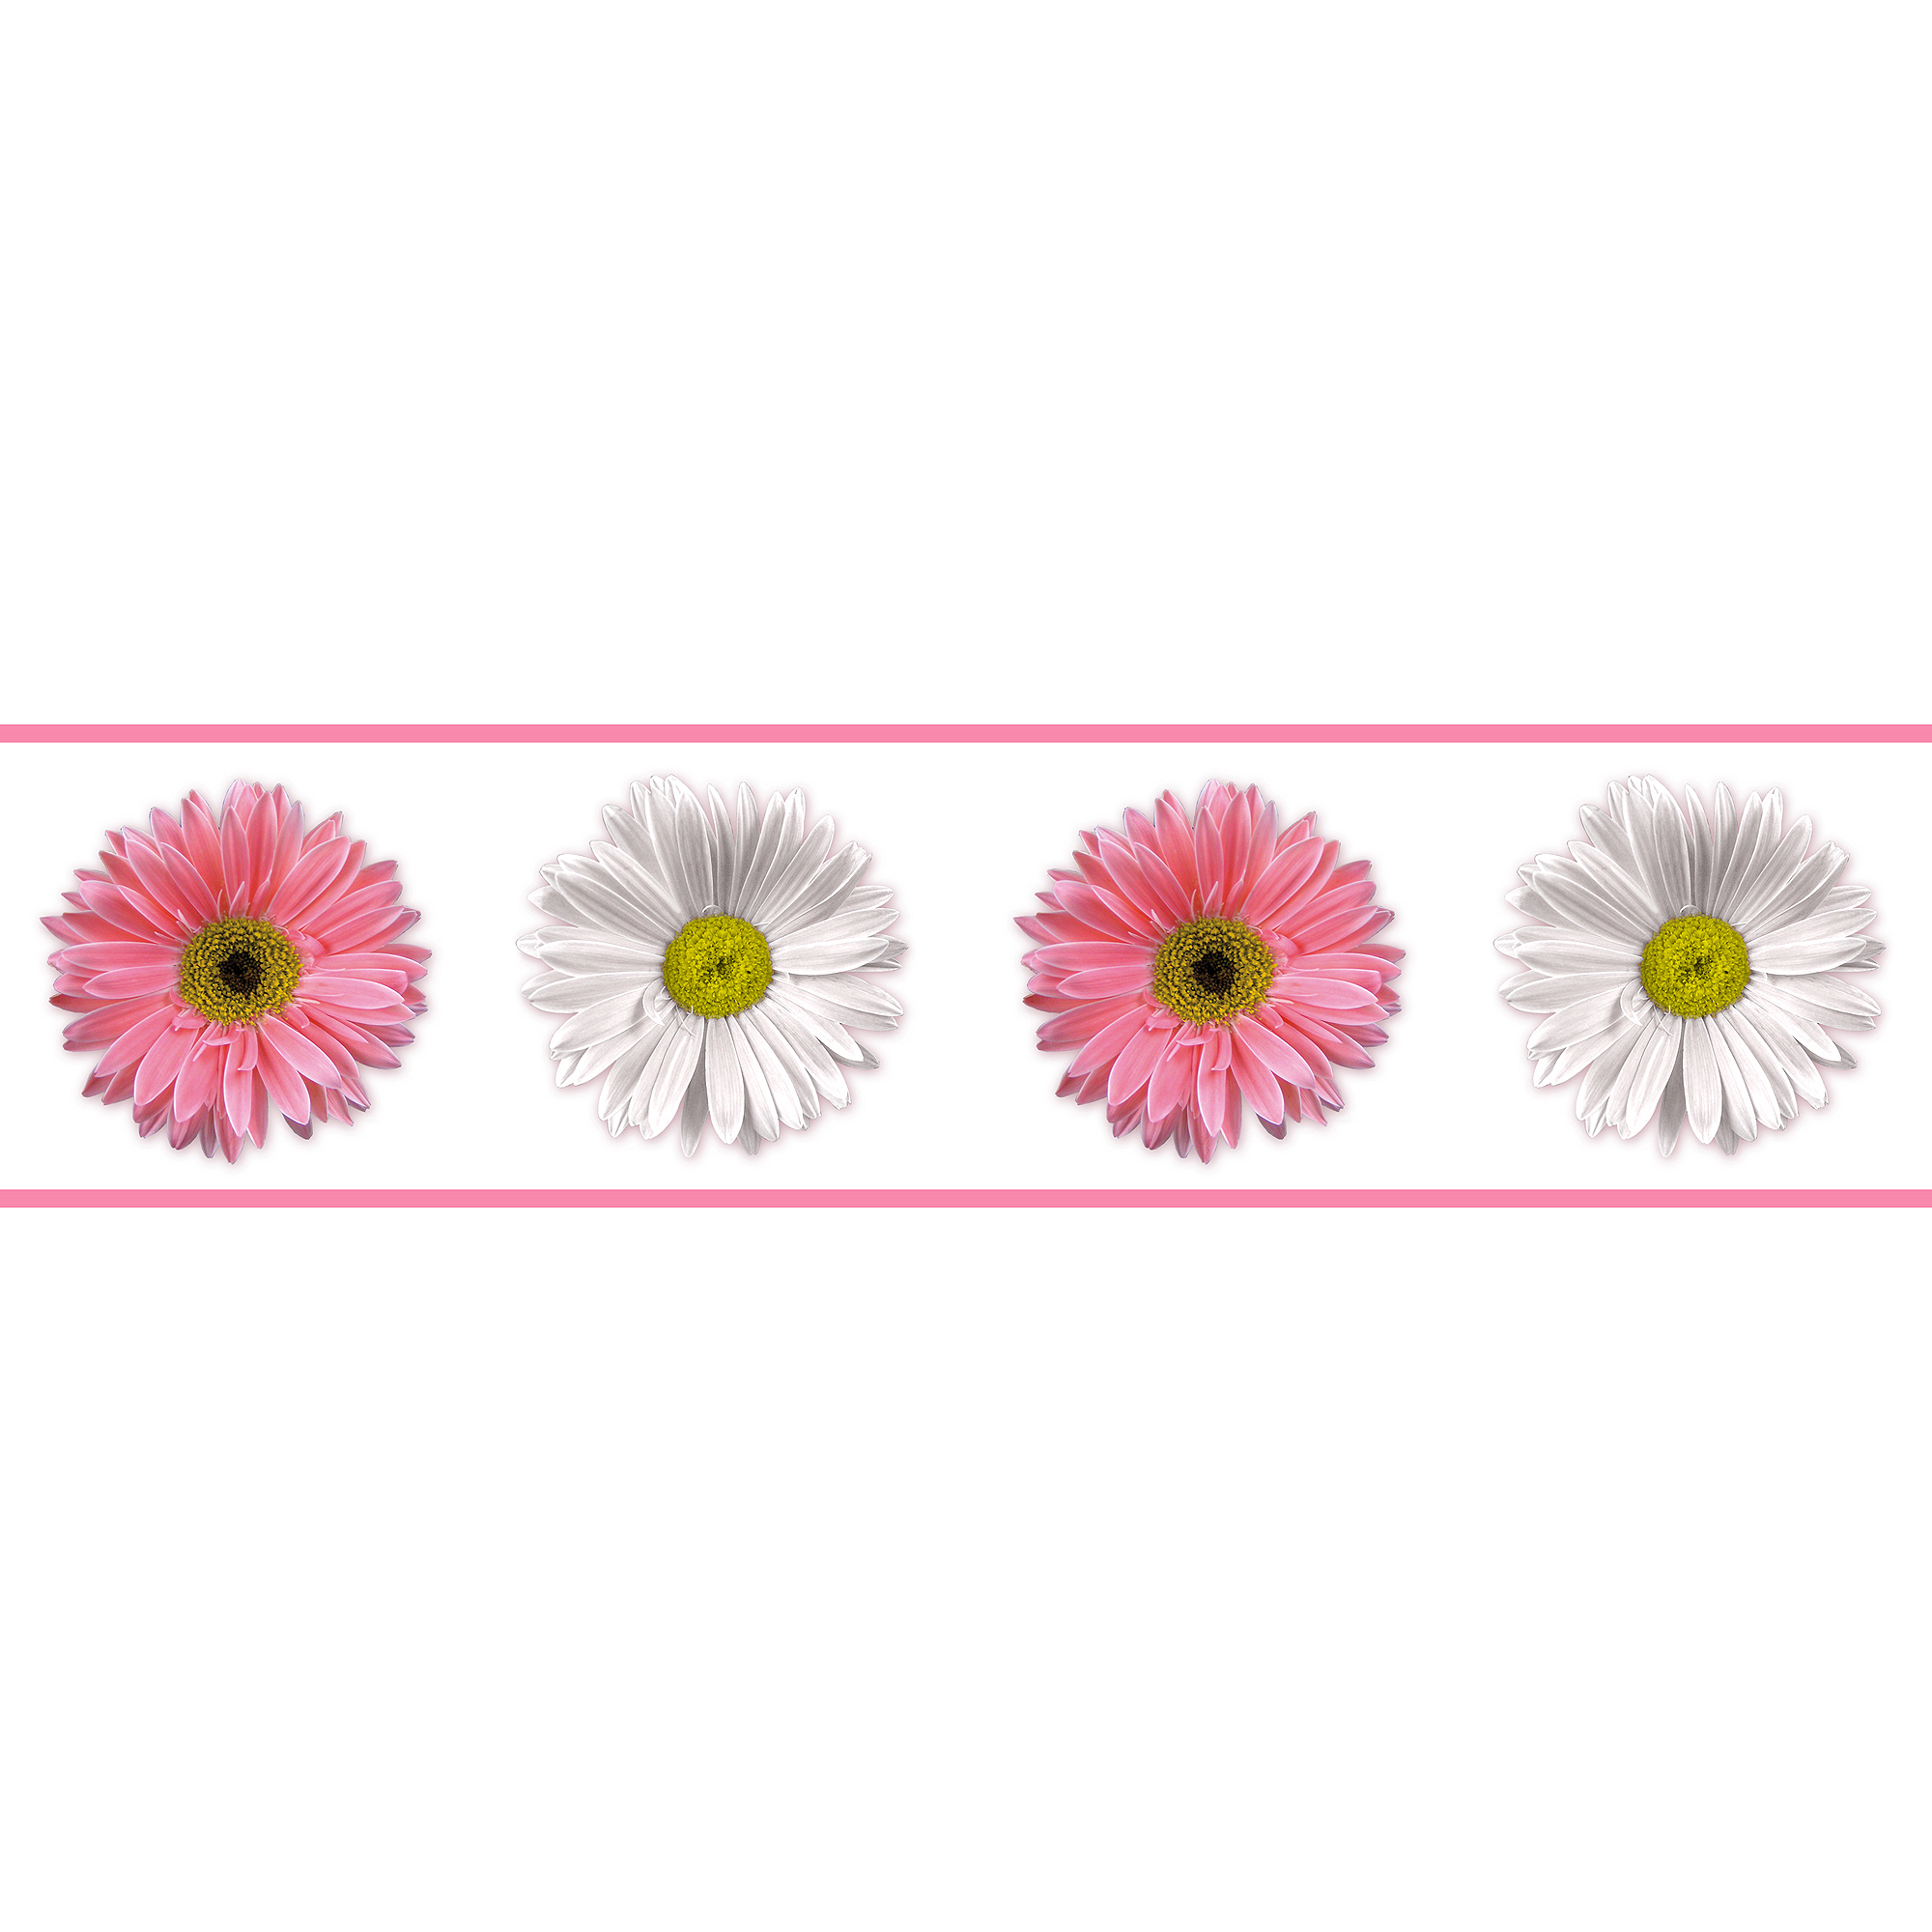 RoomMates Flower Power Peel and Stick Border